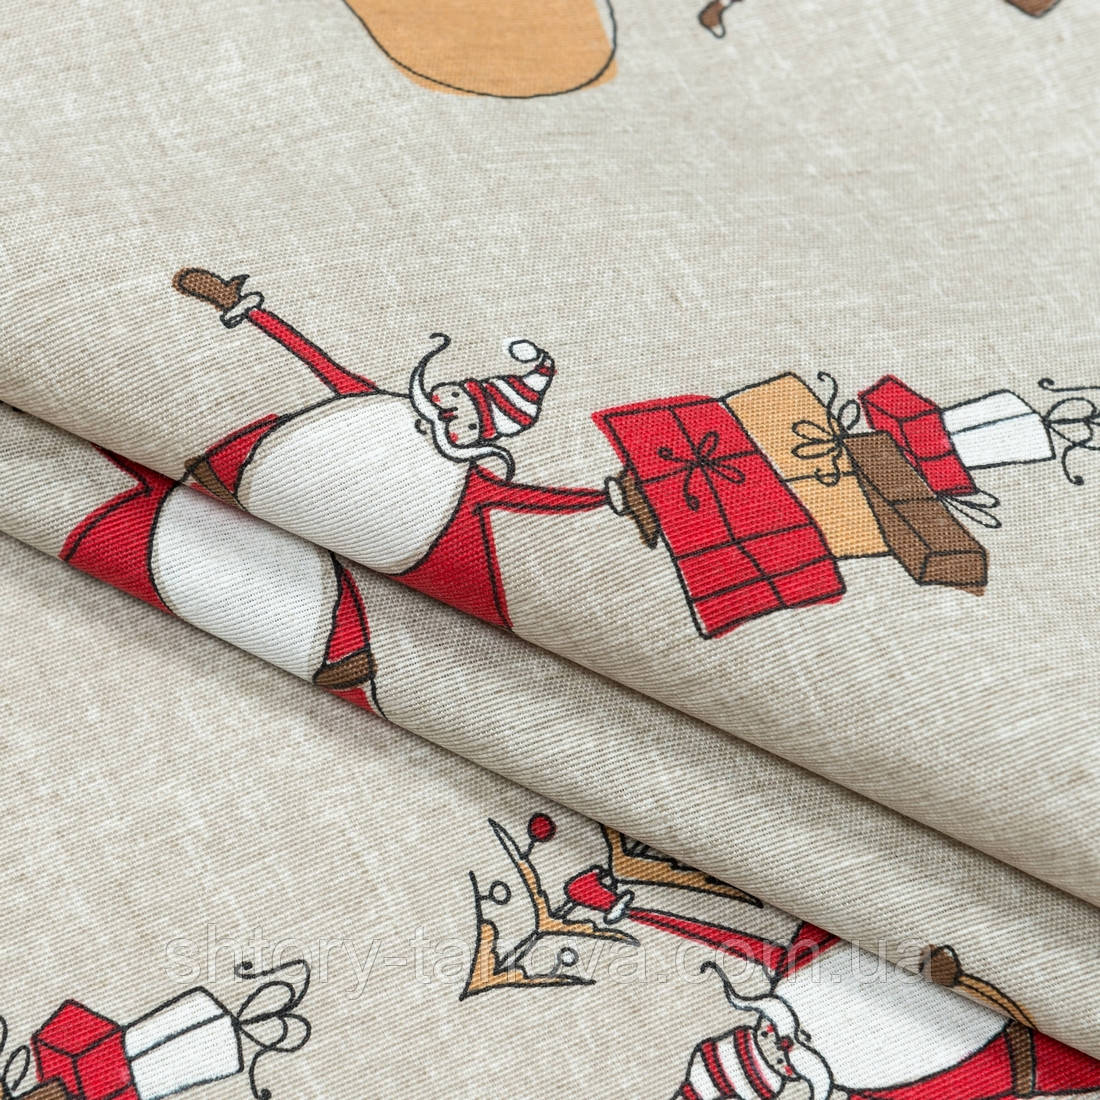 Декоративная новогодняя ткань сент/saint